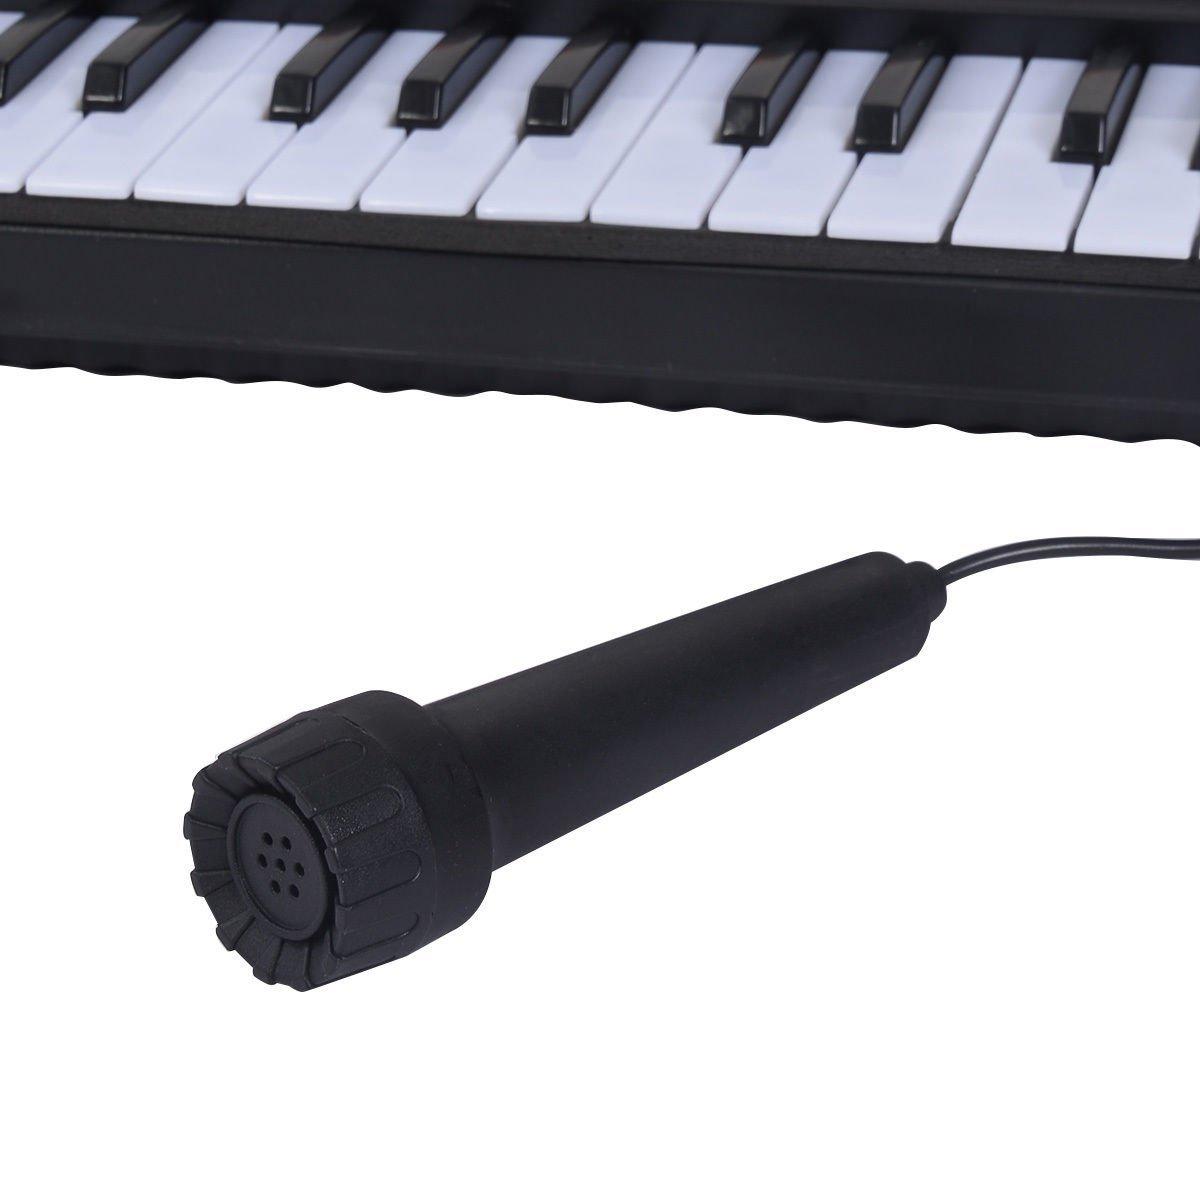 Mascarello® 54 Keys Music Electronic Keyboard Kid Electric Piano Organ W/Mic & Adapter by Mascarello (Image #6)